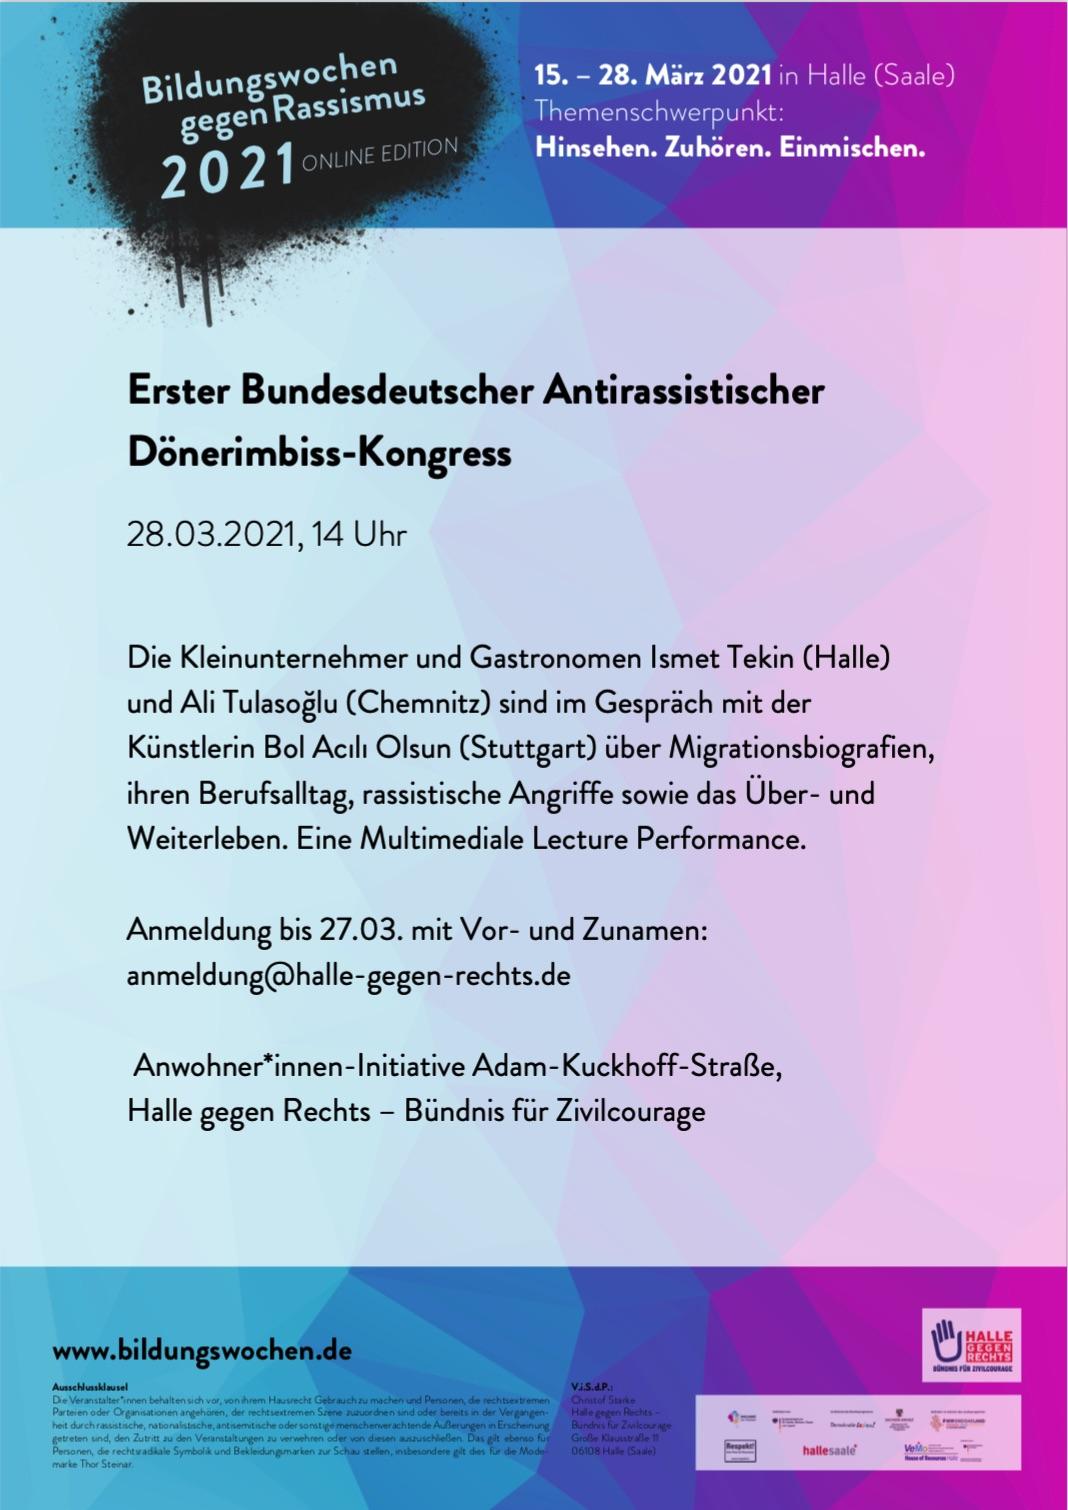 Plakat Erster Bundesdeutscher Antirassistischer Dönerimbiss-Kongress